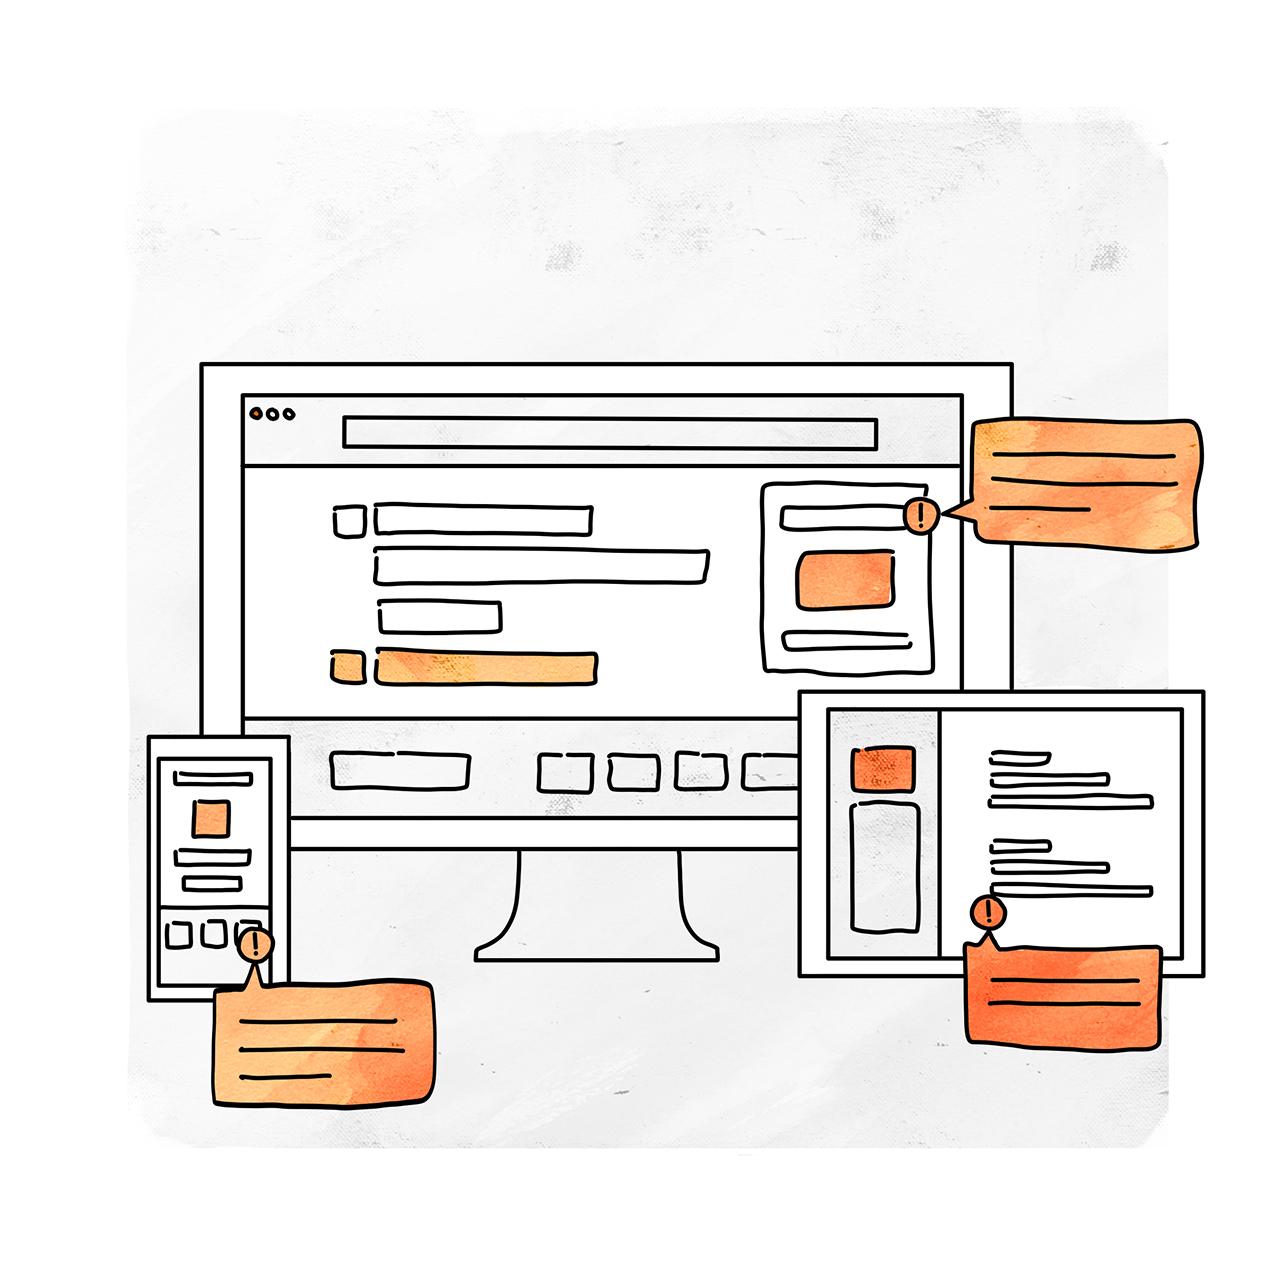 Юзабилити-экспертиза интерфейса